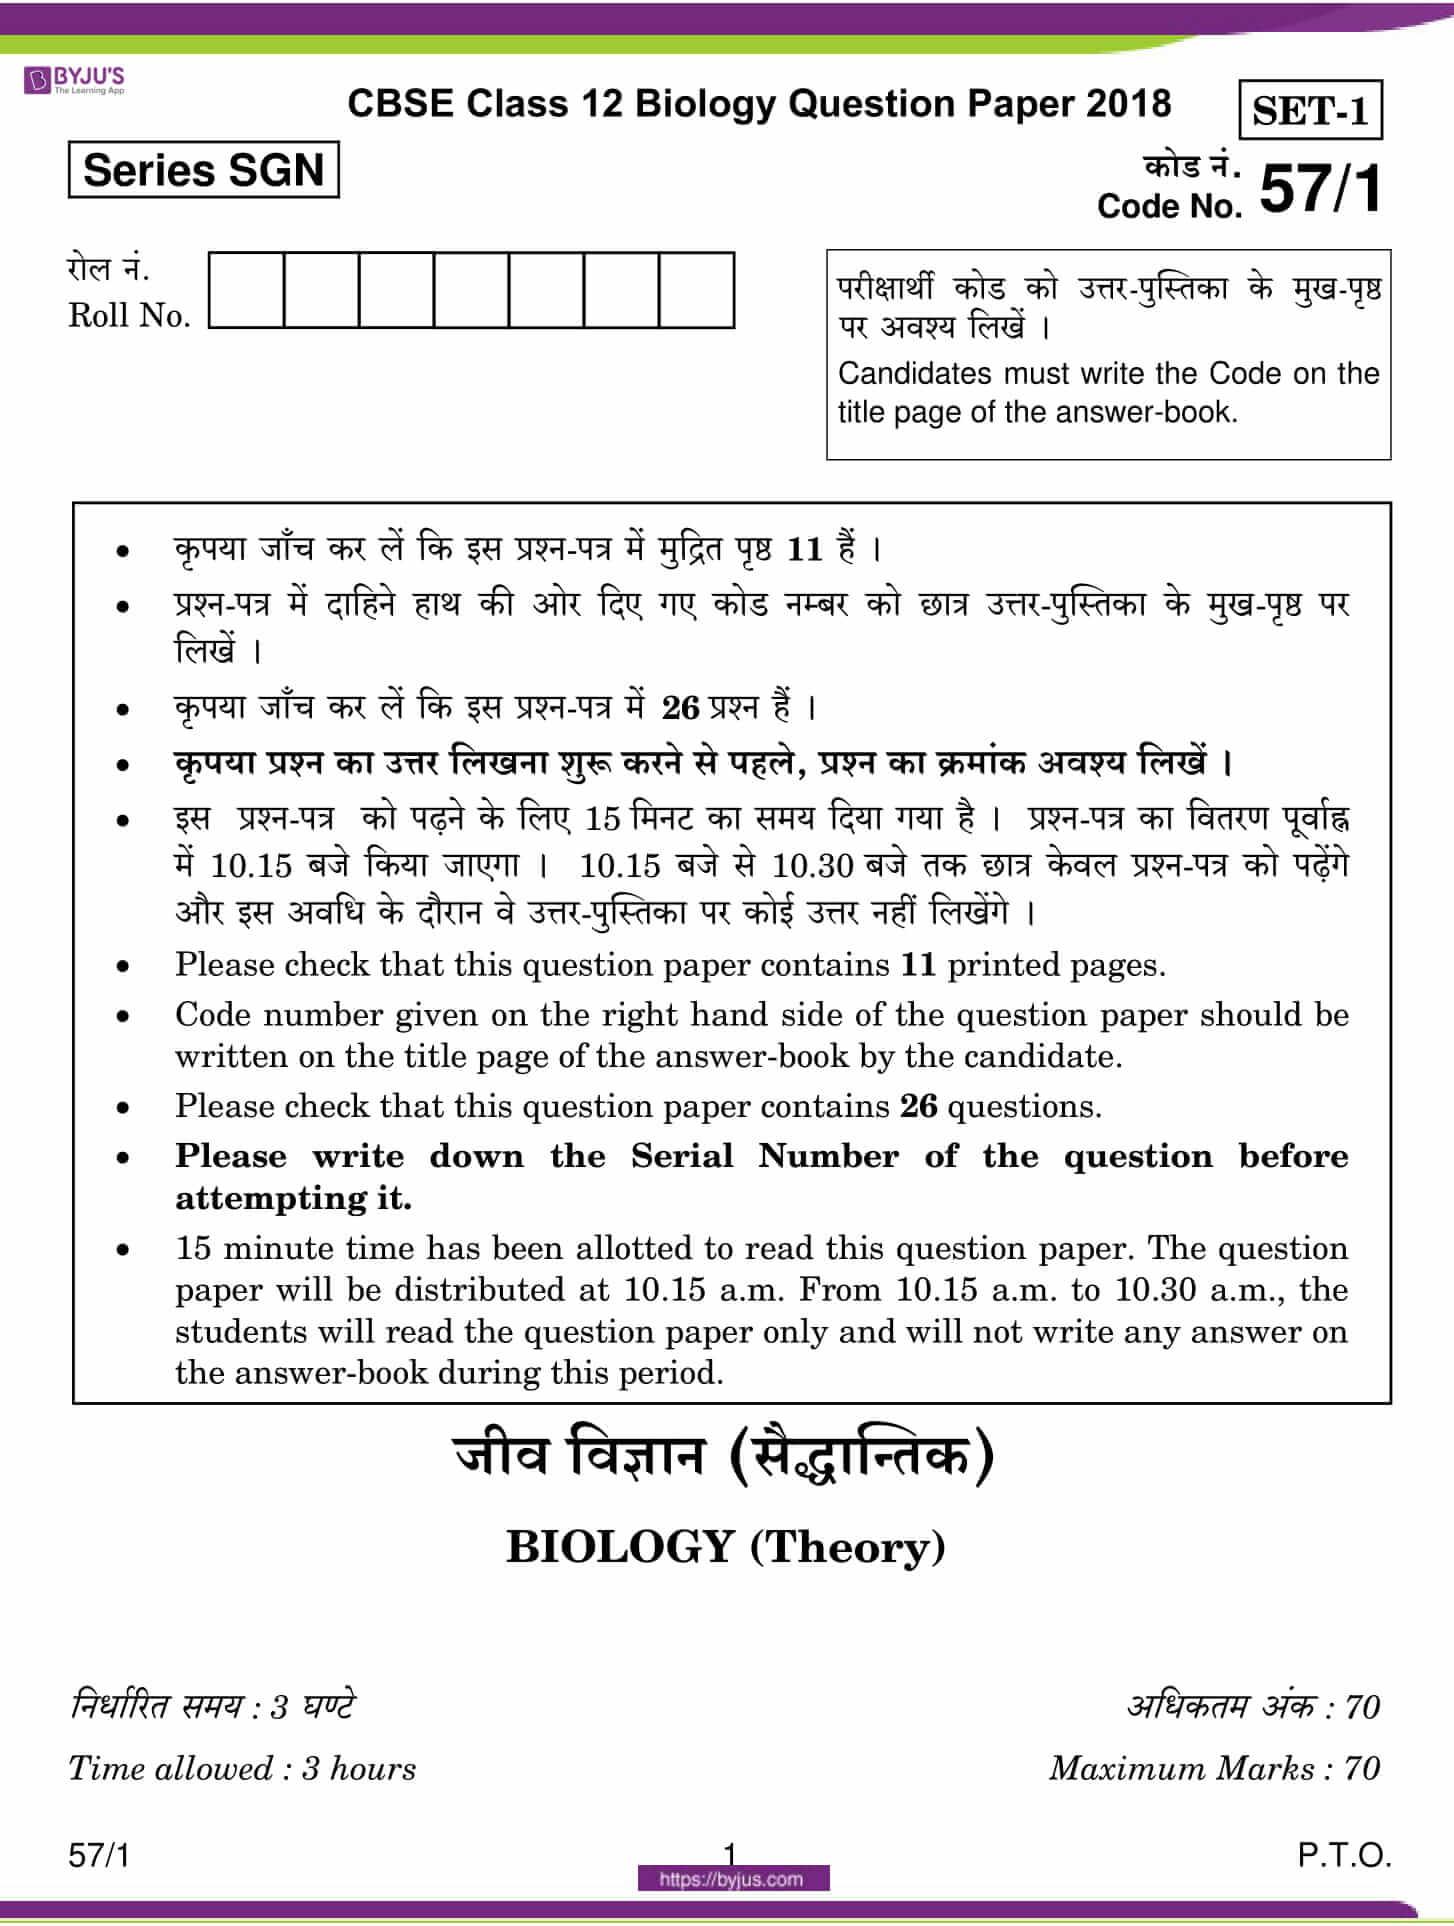 cbse class 12 qs paper 2018 bio set 1